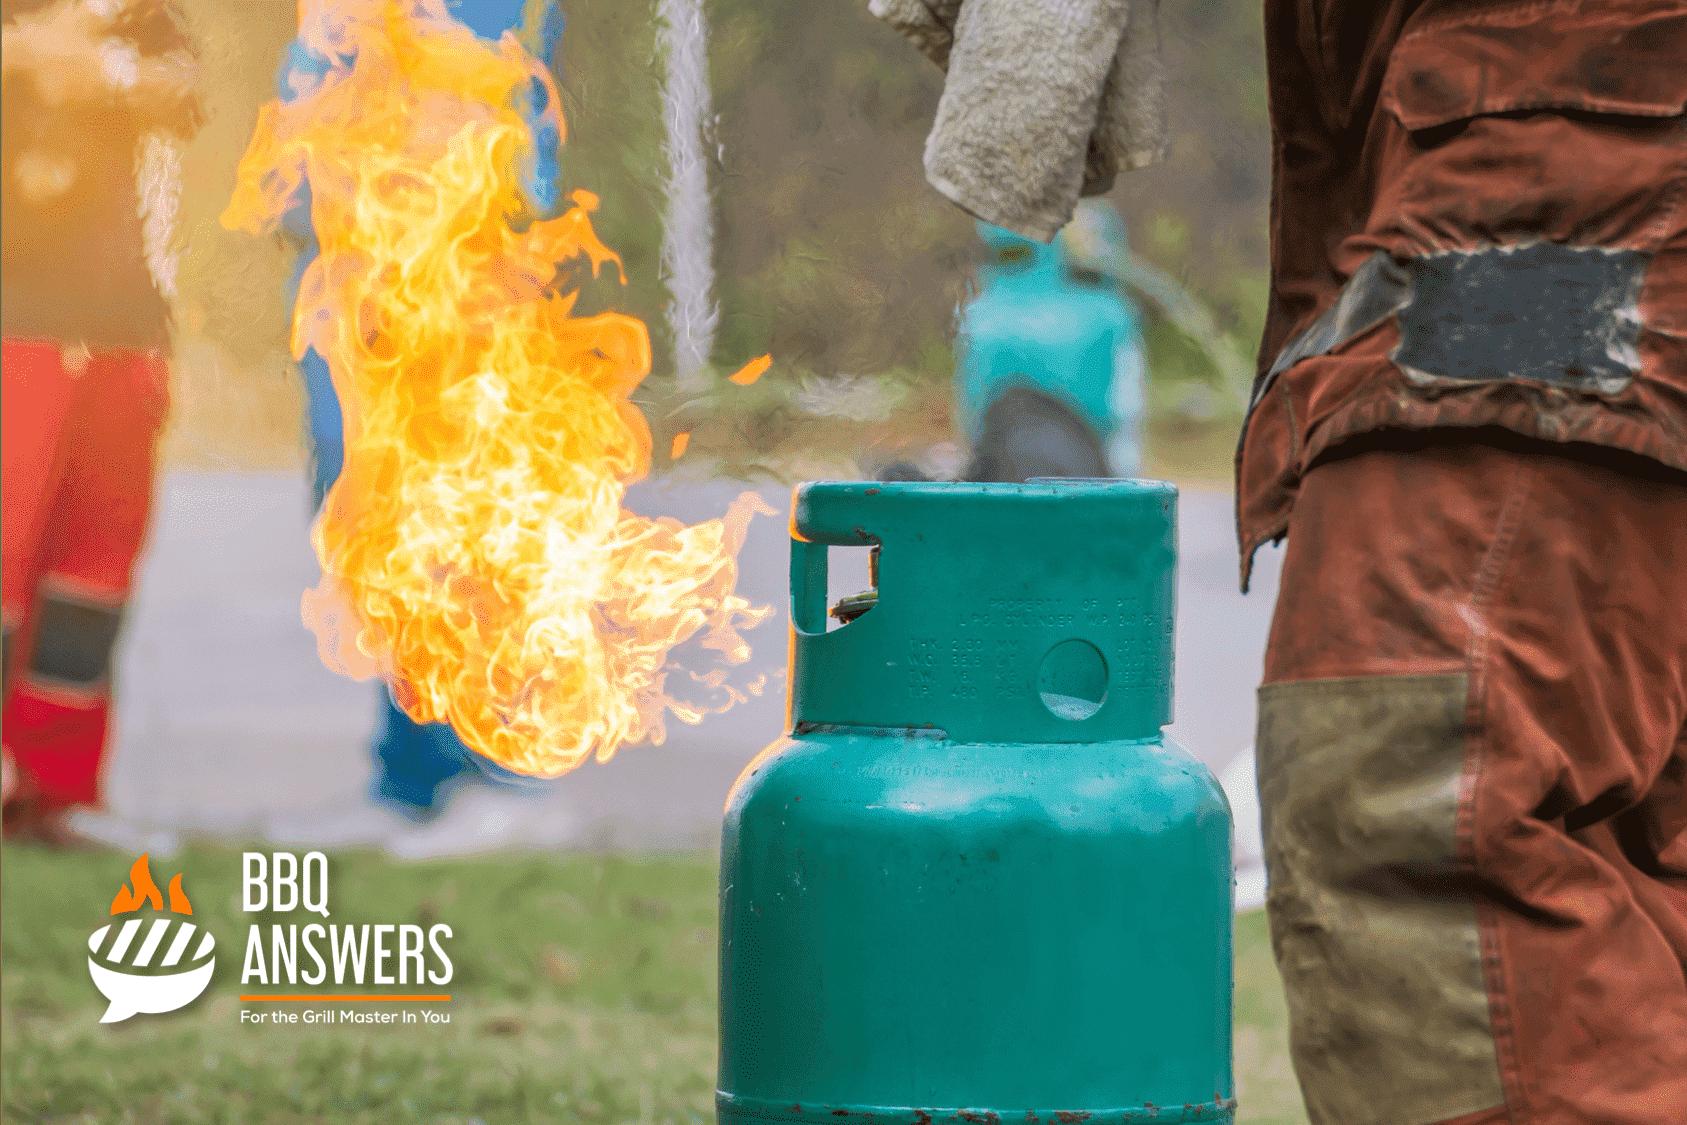 Gas Bottle Explosion | BBQanswers